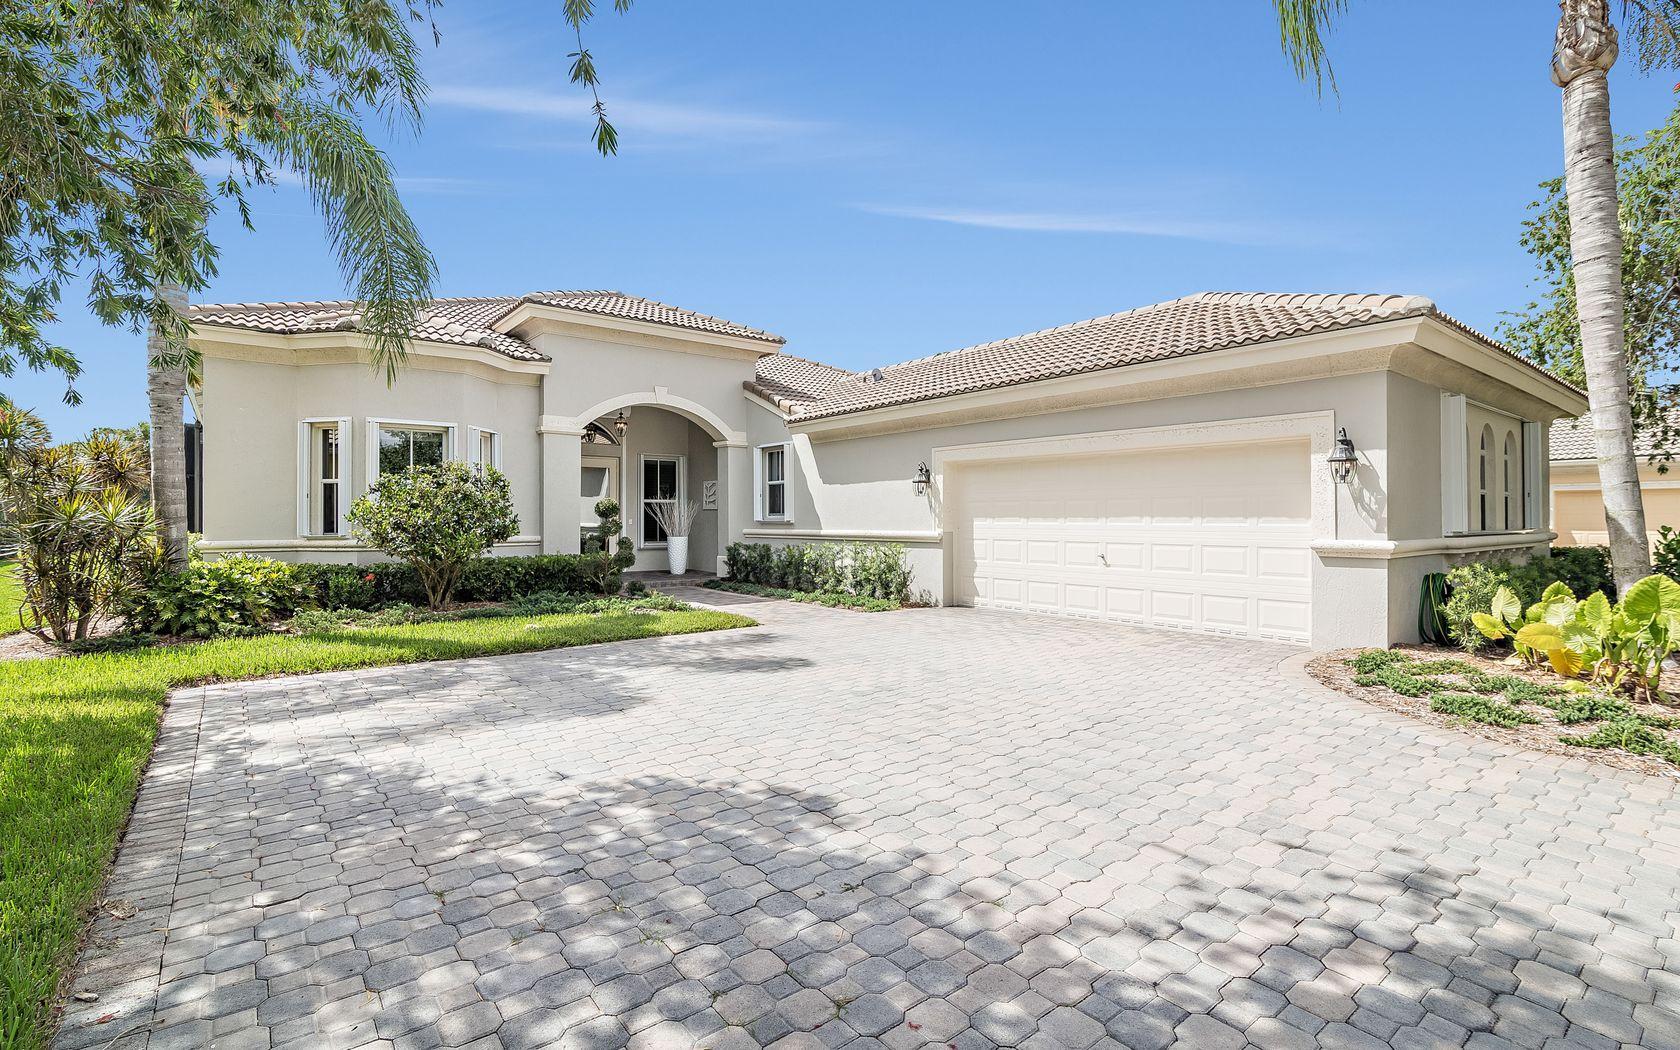 Details for 7870 Preserve Drive, West Palm Beach, FL 33412